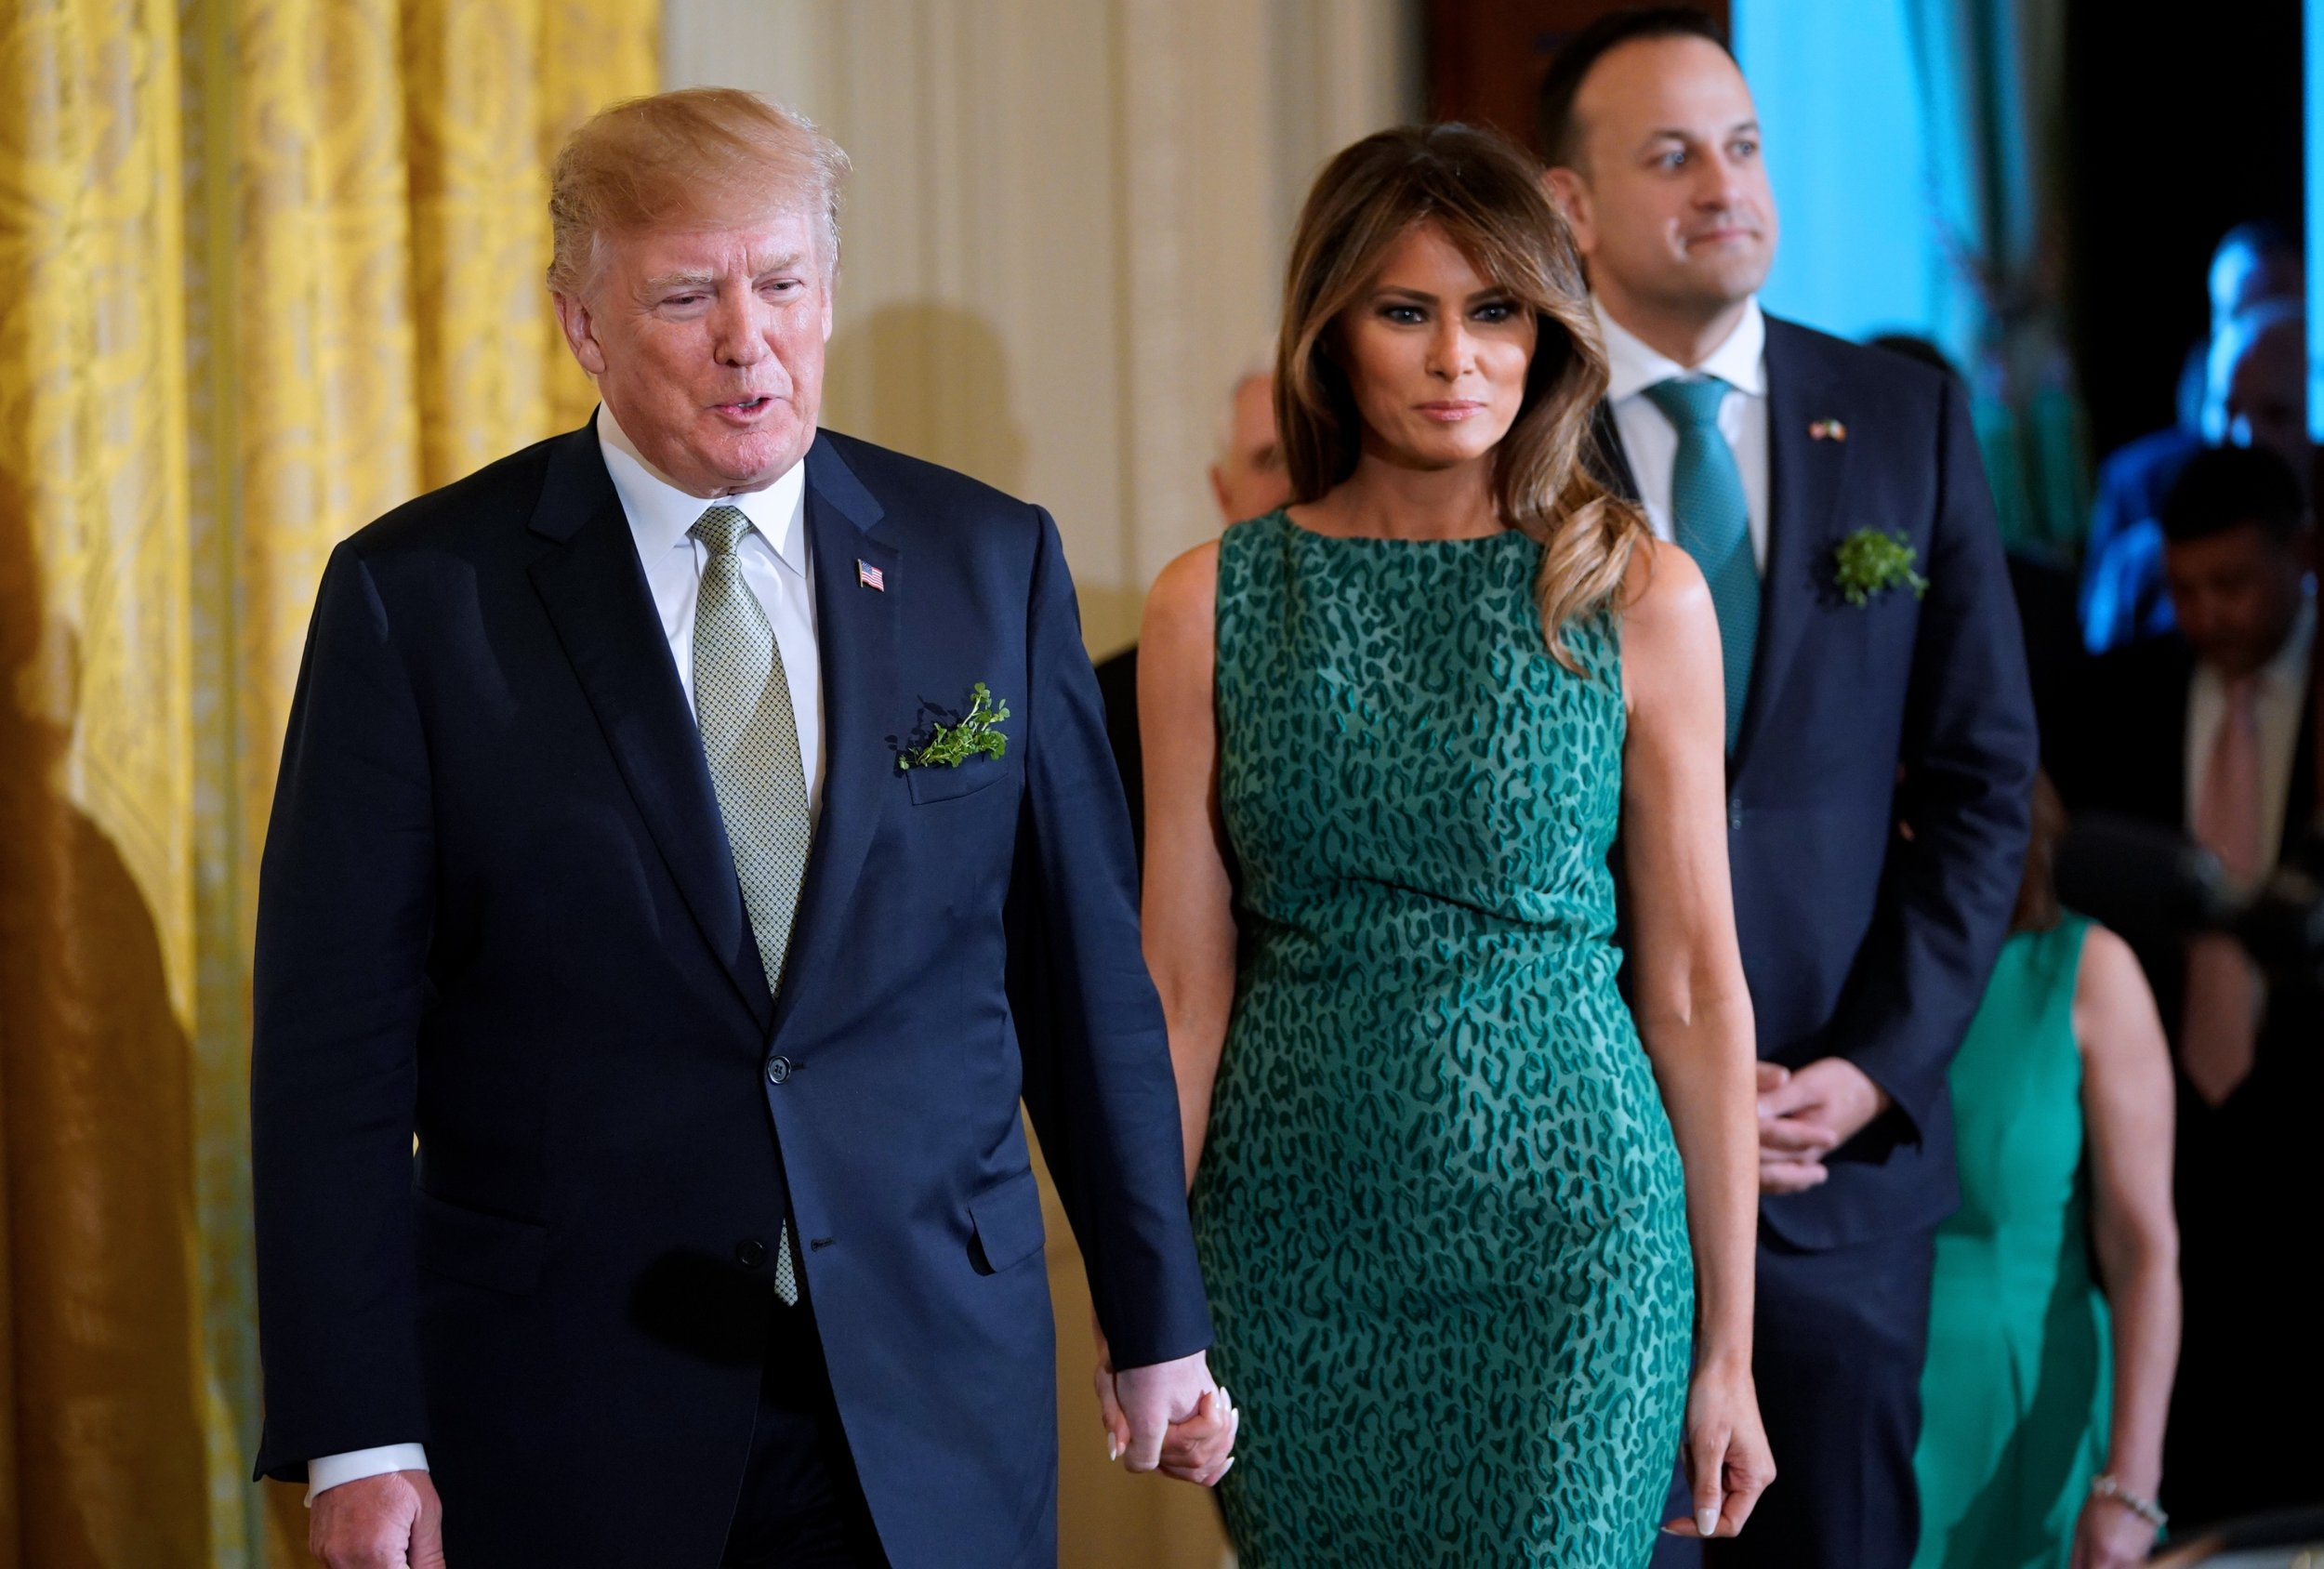 Trump shamrock